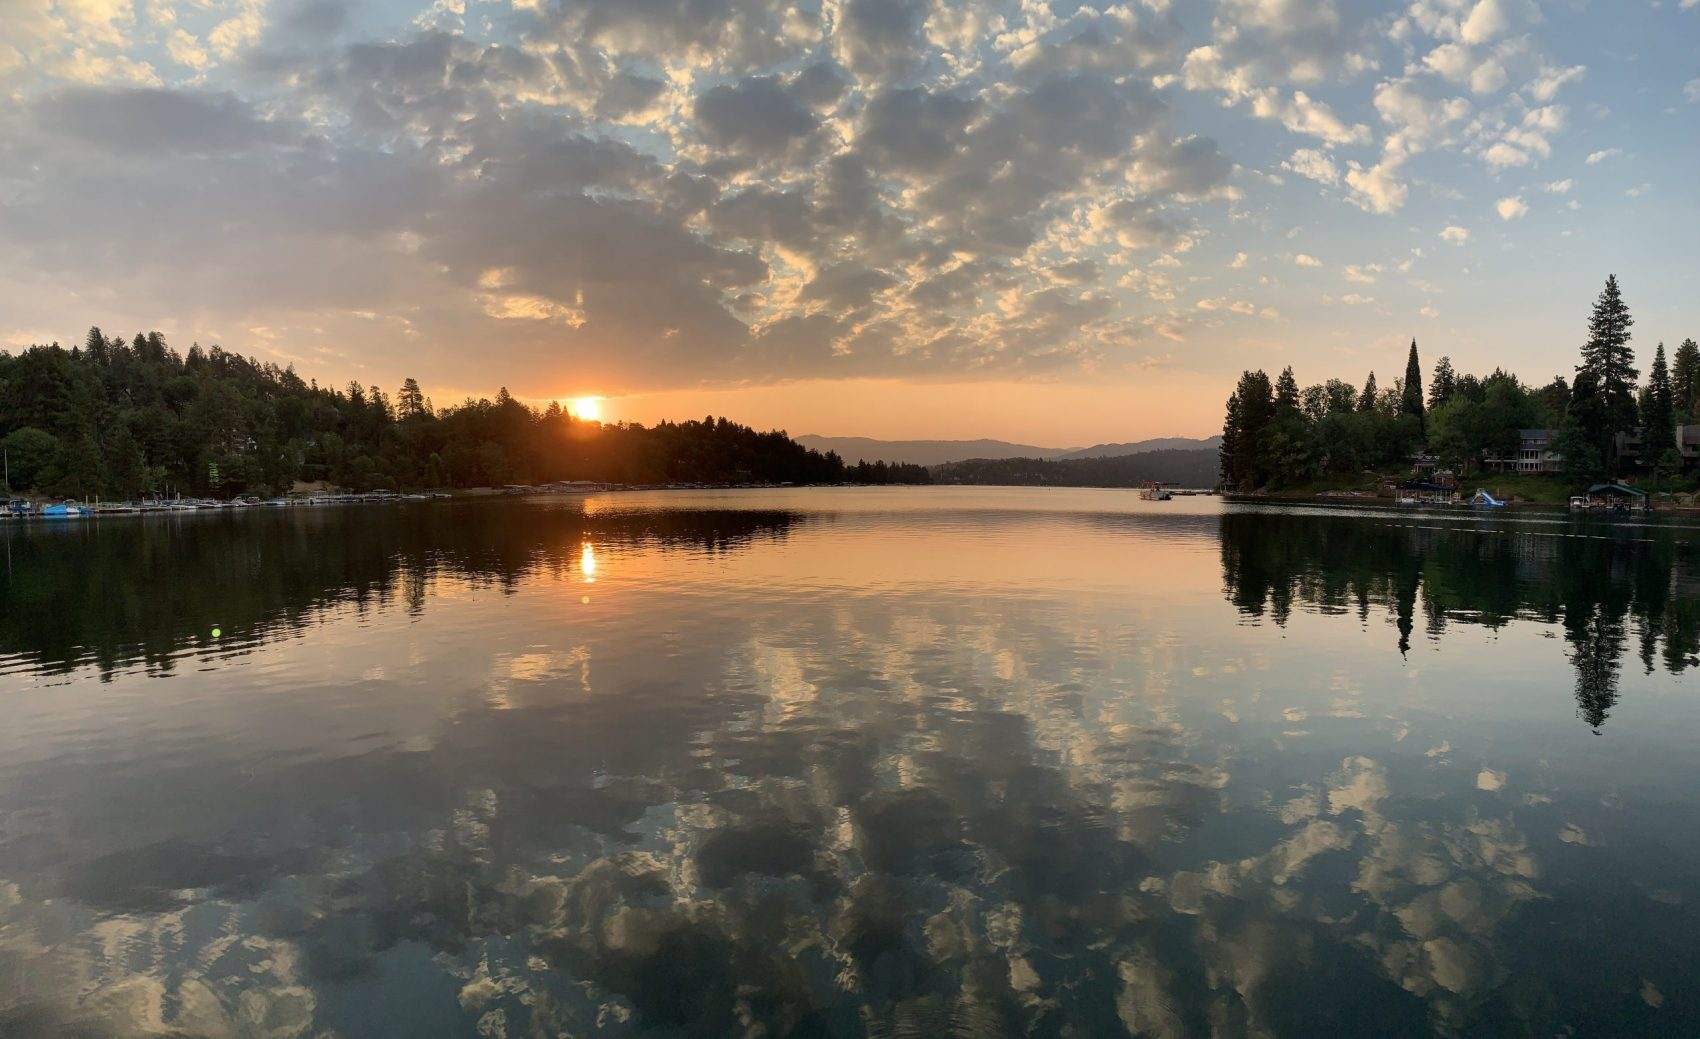 lake_arrowhead_sunrise-min1-scaled.jpg